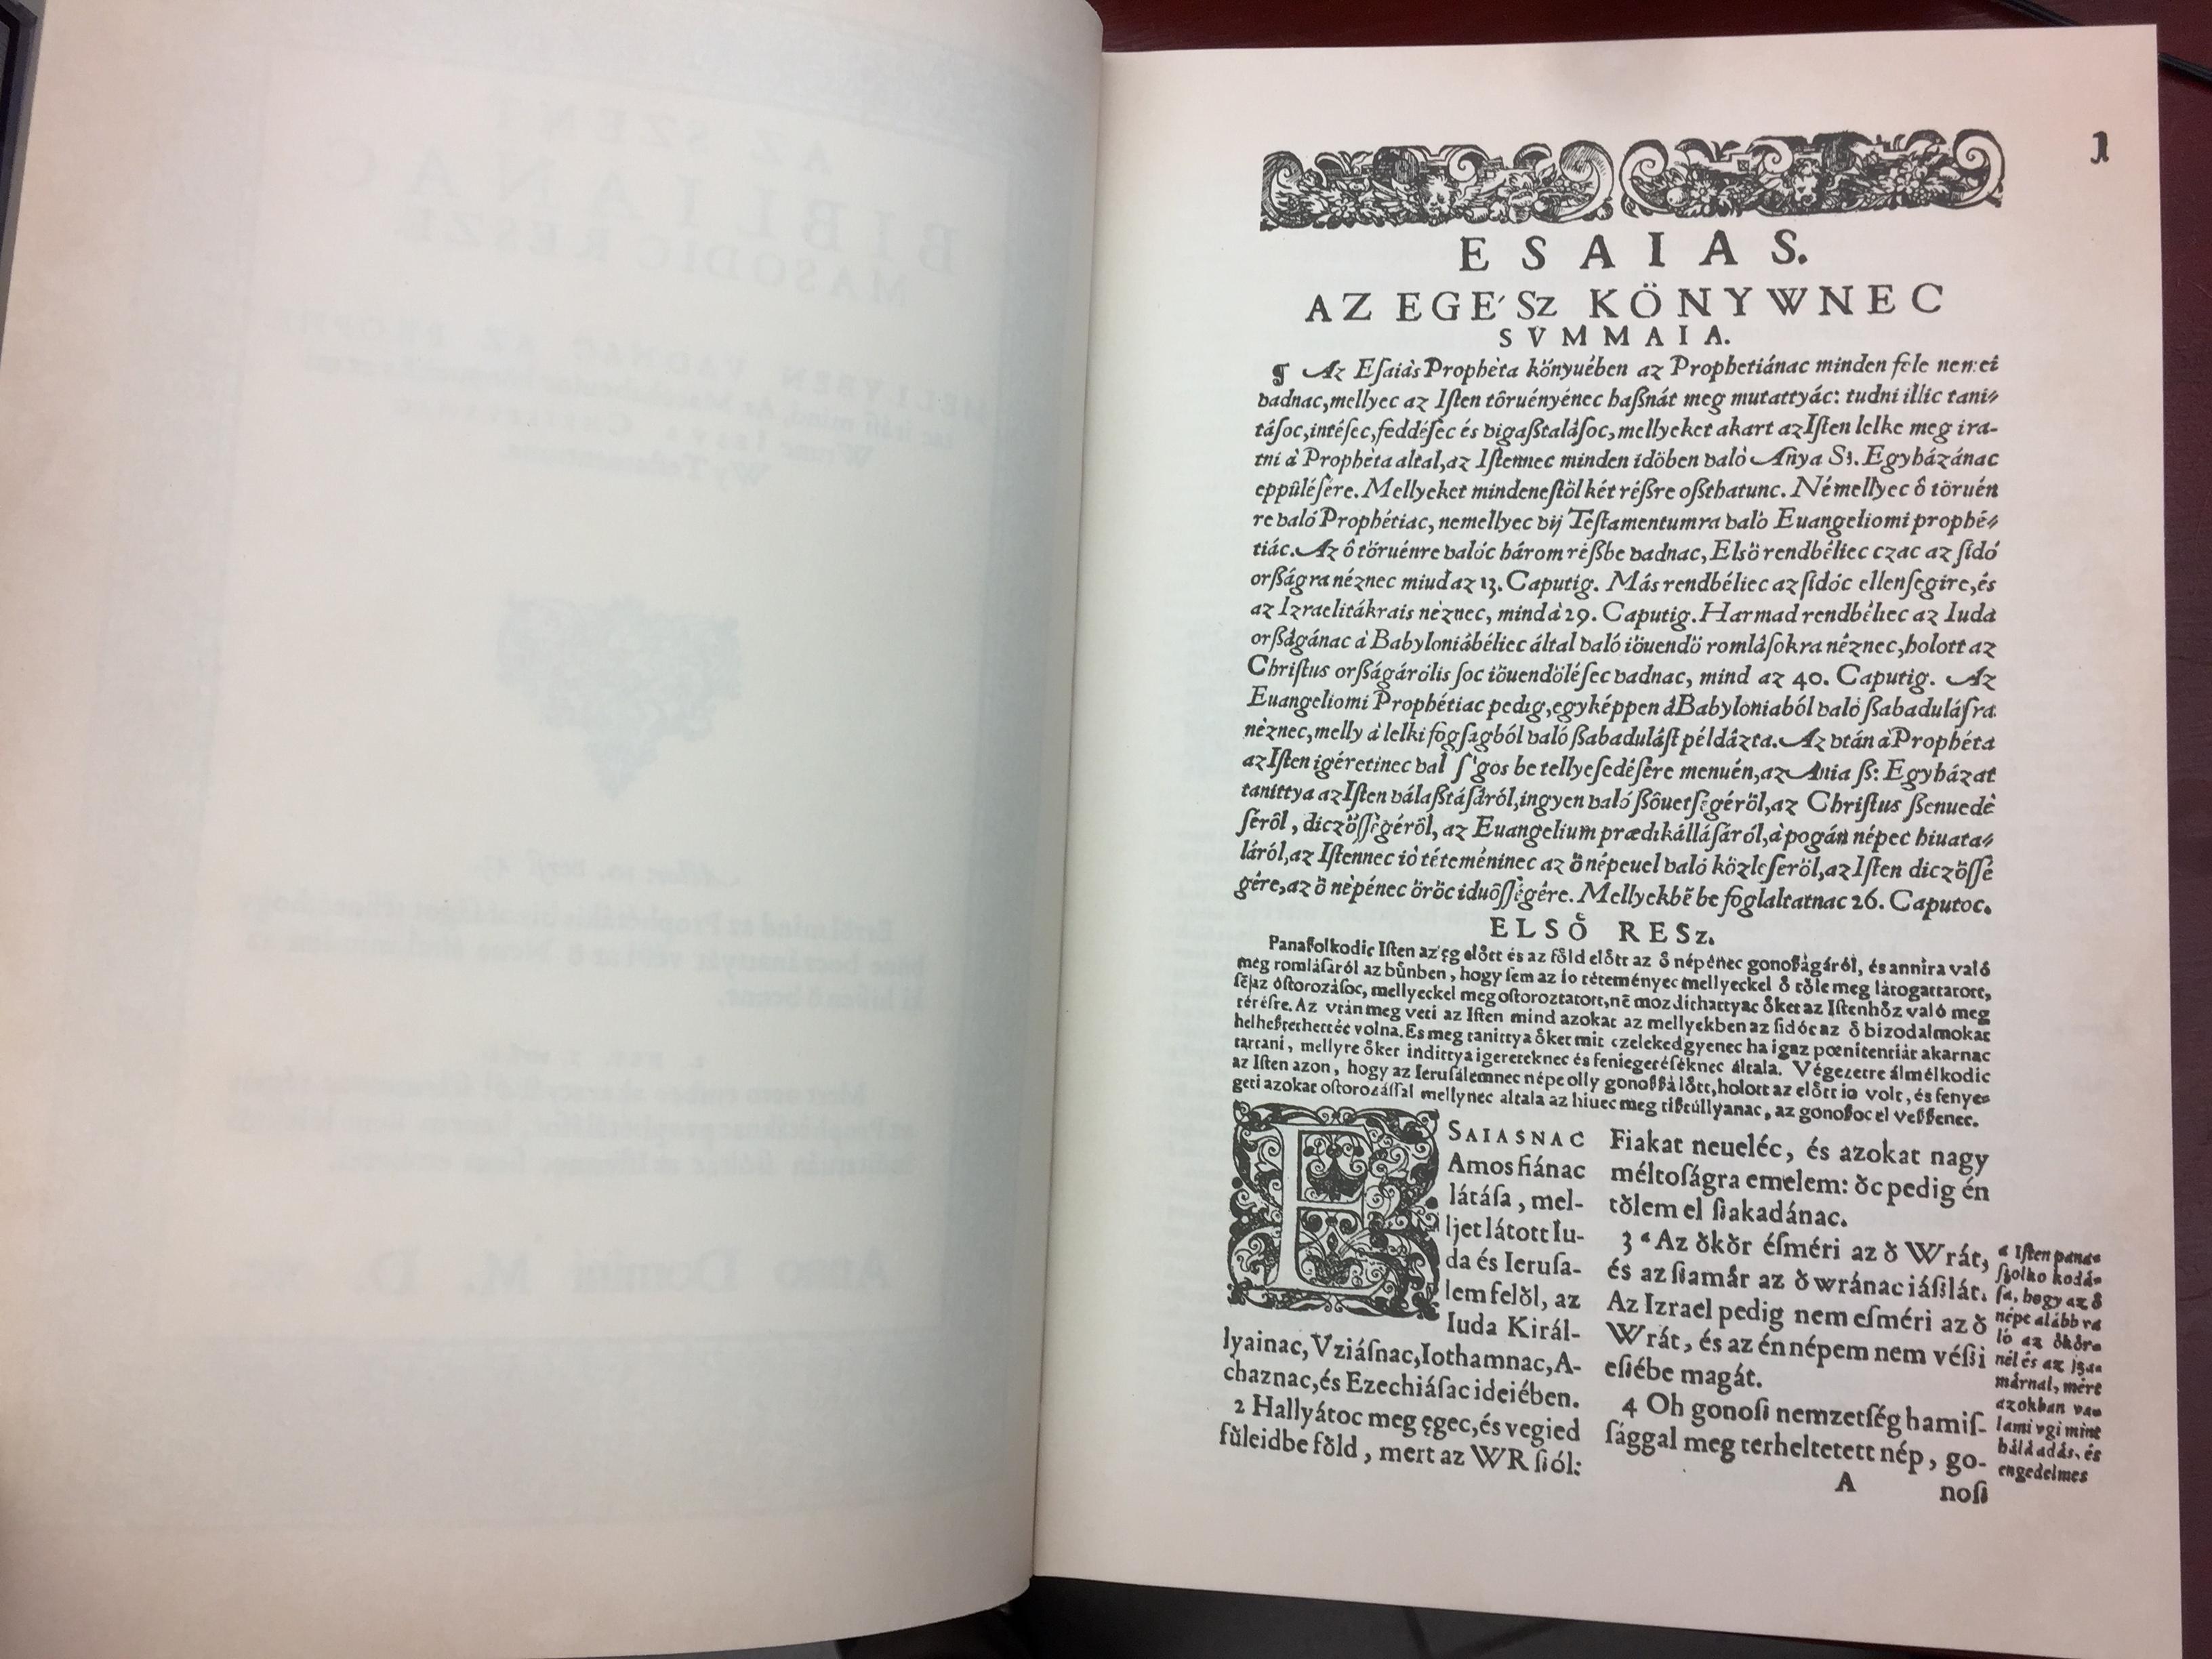 vizsolyi-biblia-hungarian-holy-bible-reprint-of-1590-version-9-.jpg